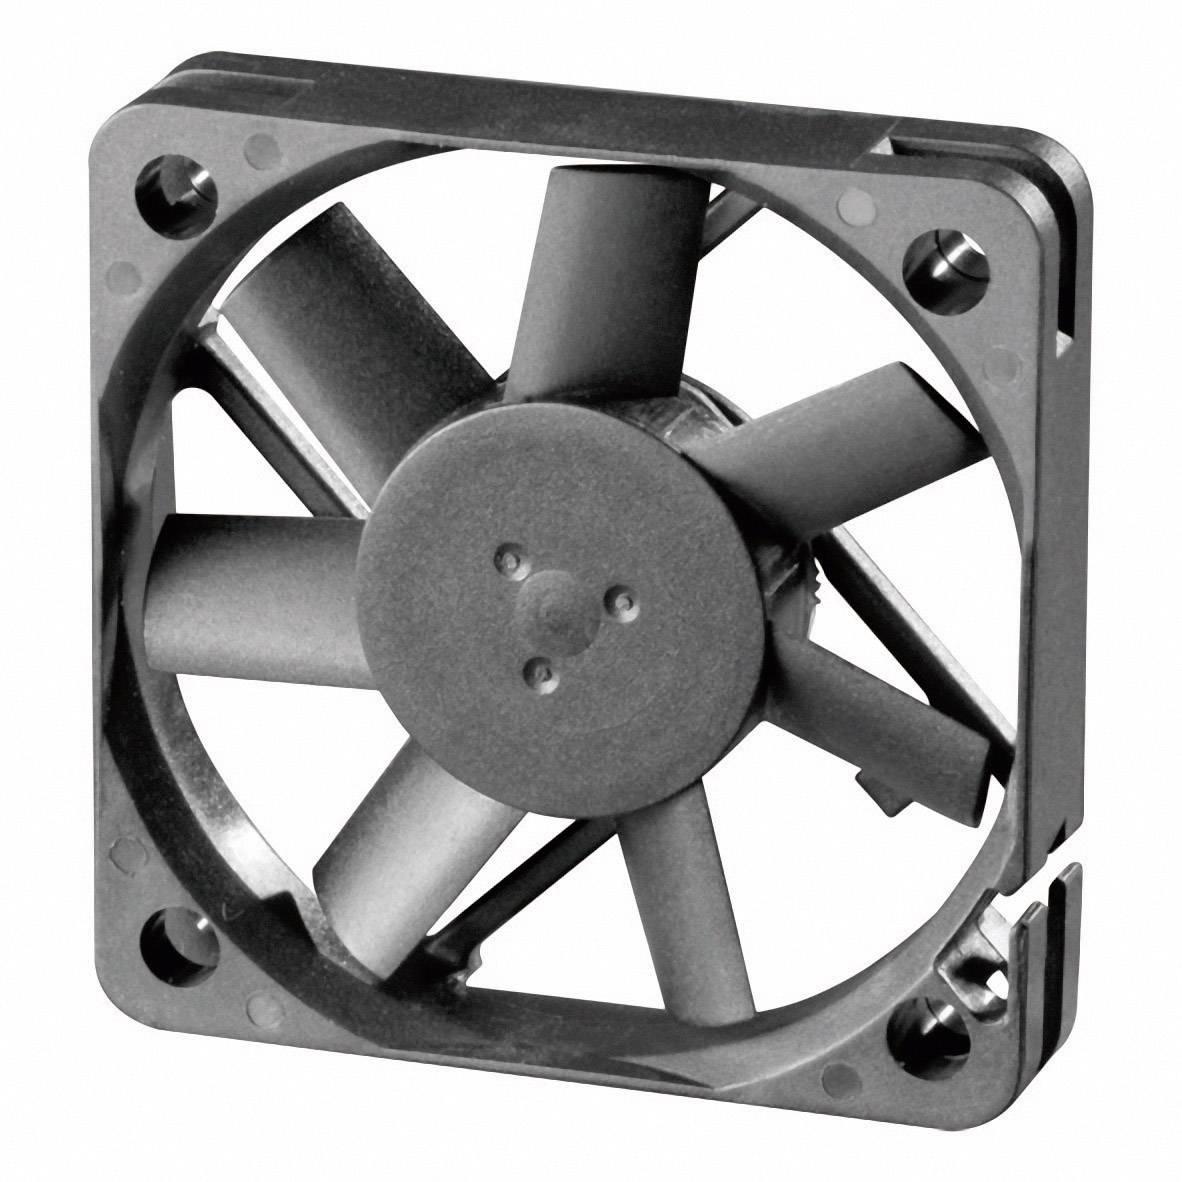 Axiálny ventilátor Sunon MB50101V2-0000-A99 MB50101V2-0000-A99, 12 V/DC, 26 dB, (d x š x v) 50 x 50 x 10 mm